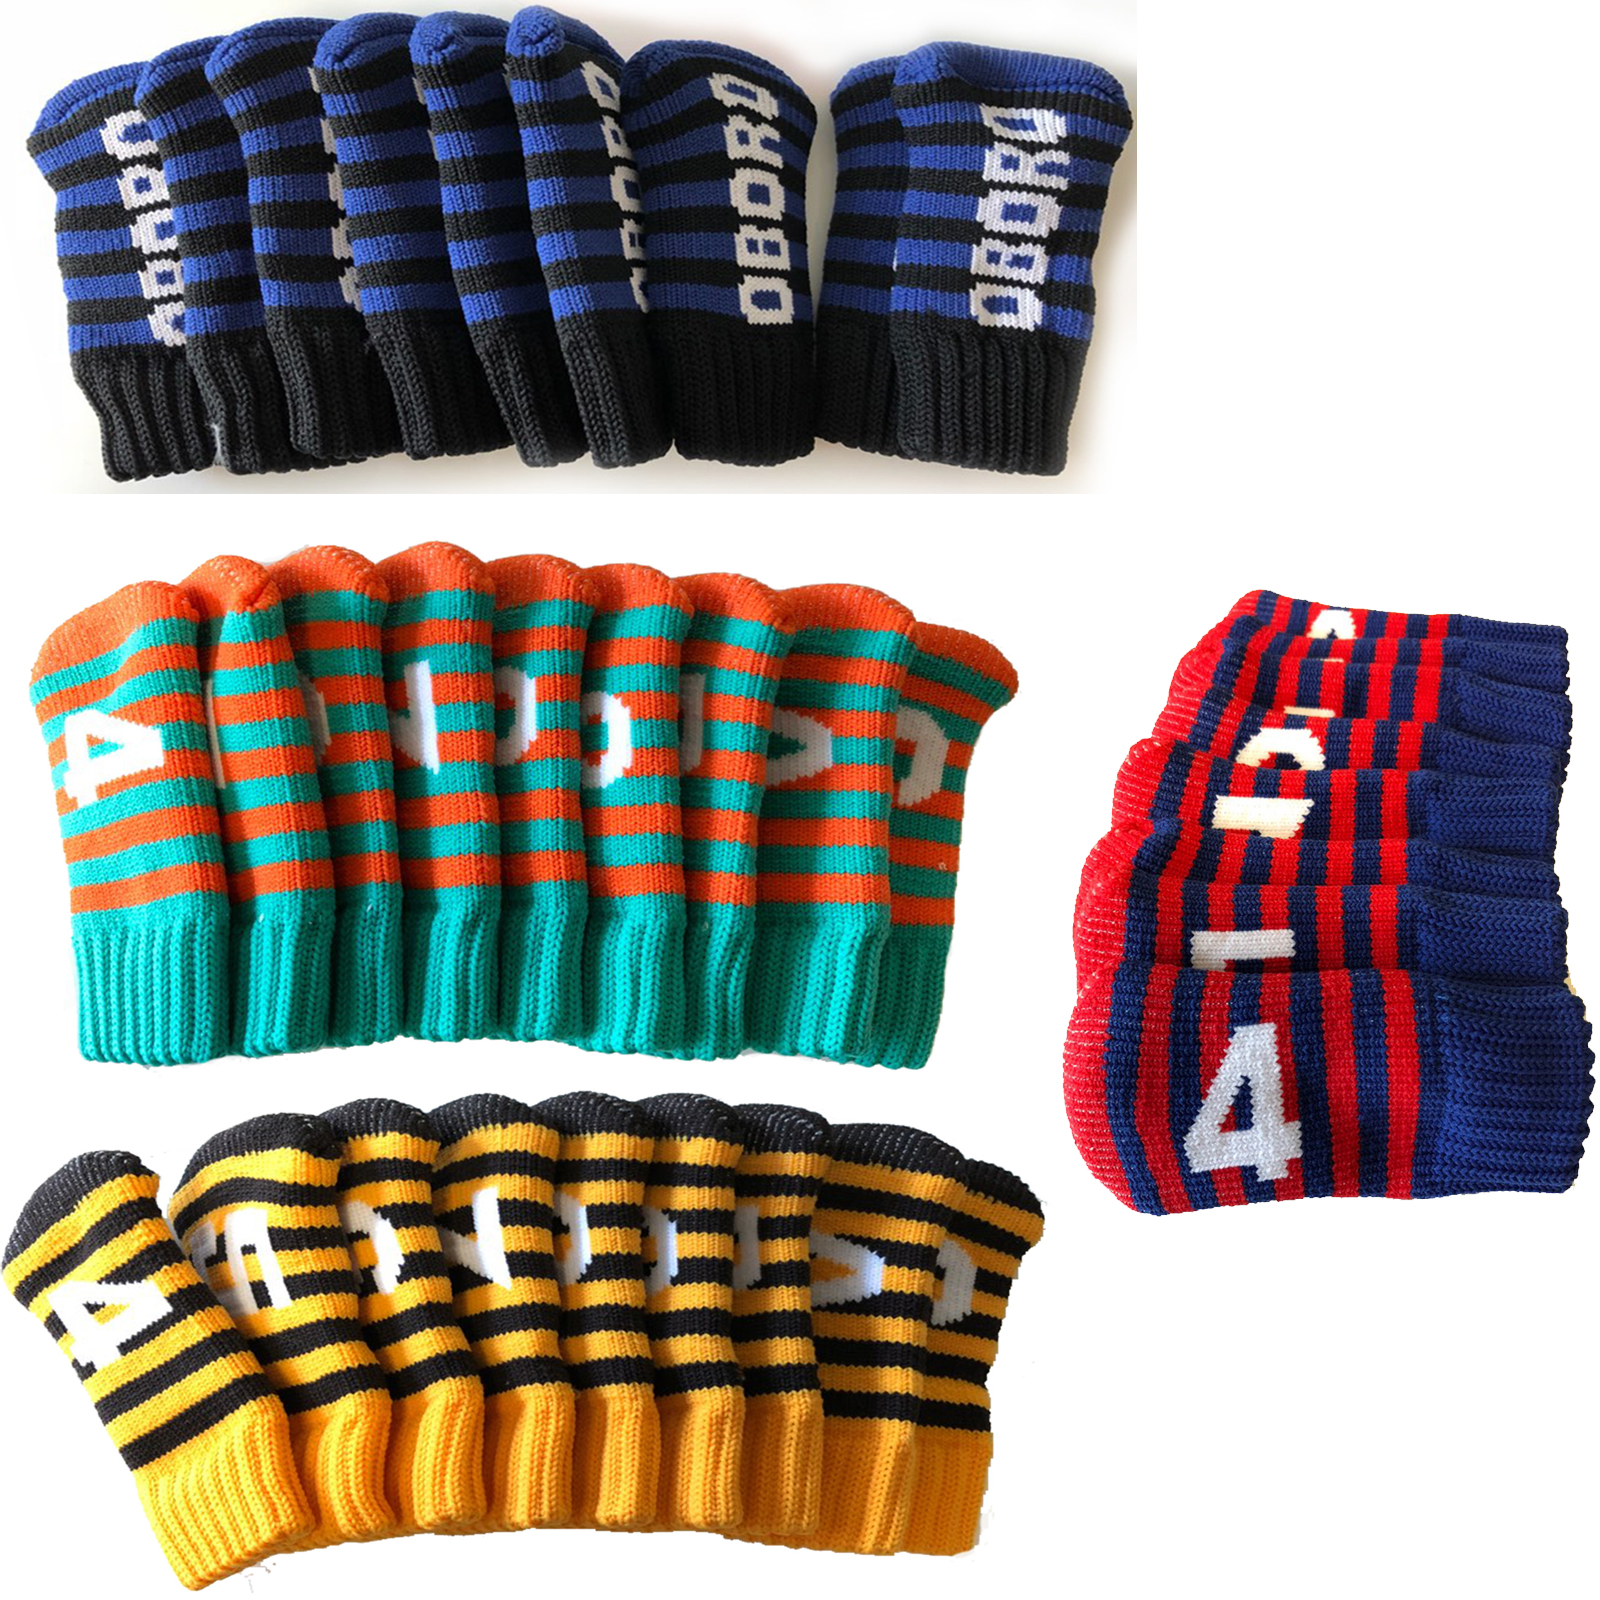 Best Knit Knitted Golf Club Iron Head Covers Set Socks Style Korean Golf Ebay